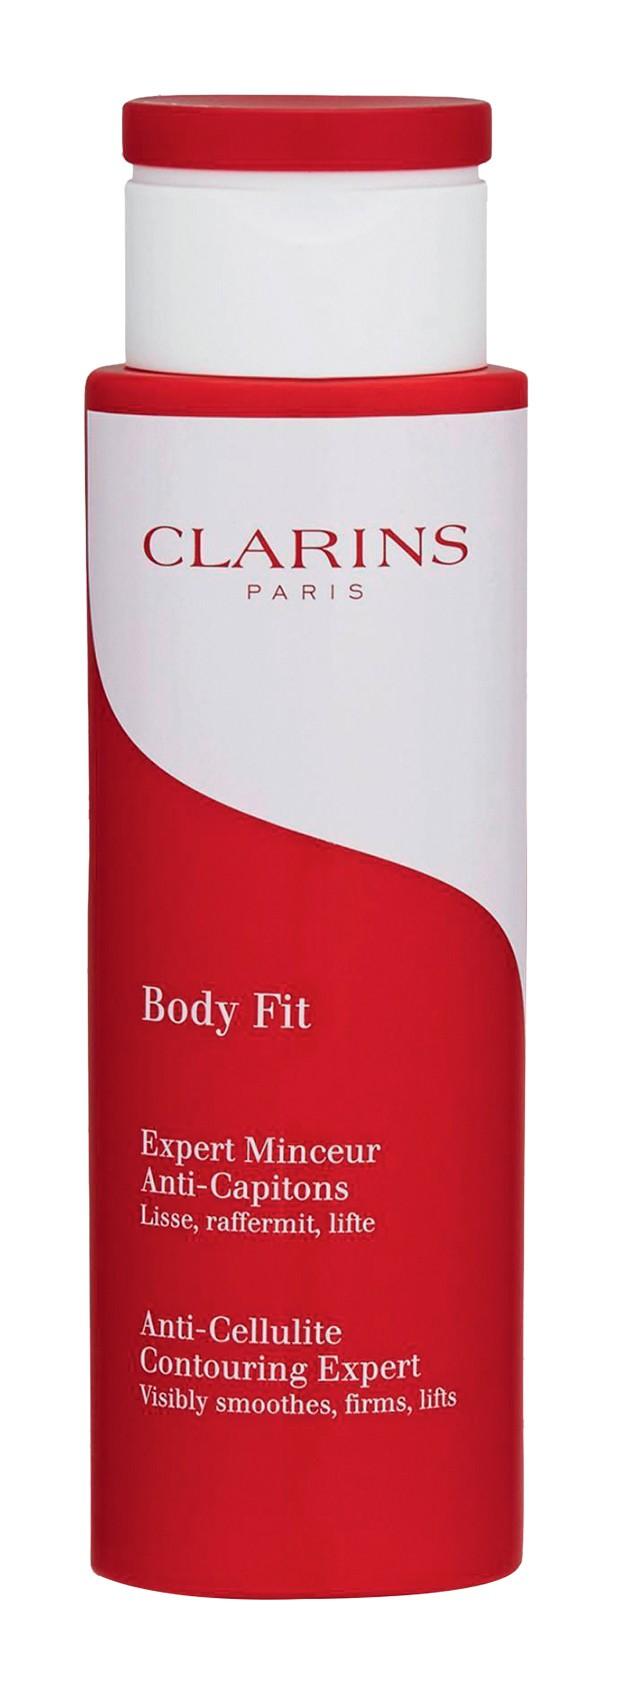 Creme de contorno corporal Body Fit, R$ 329, Clarins (Foto: .)